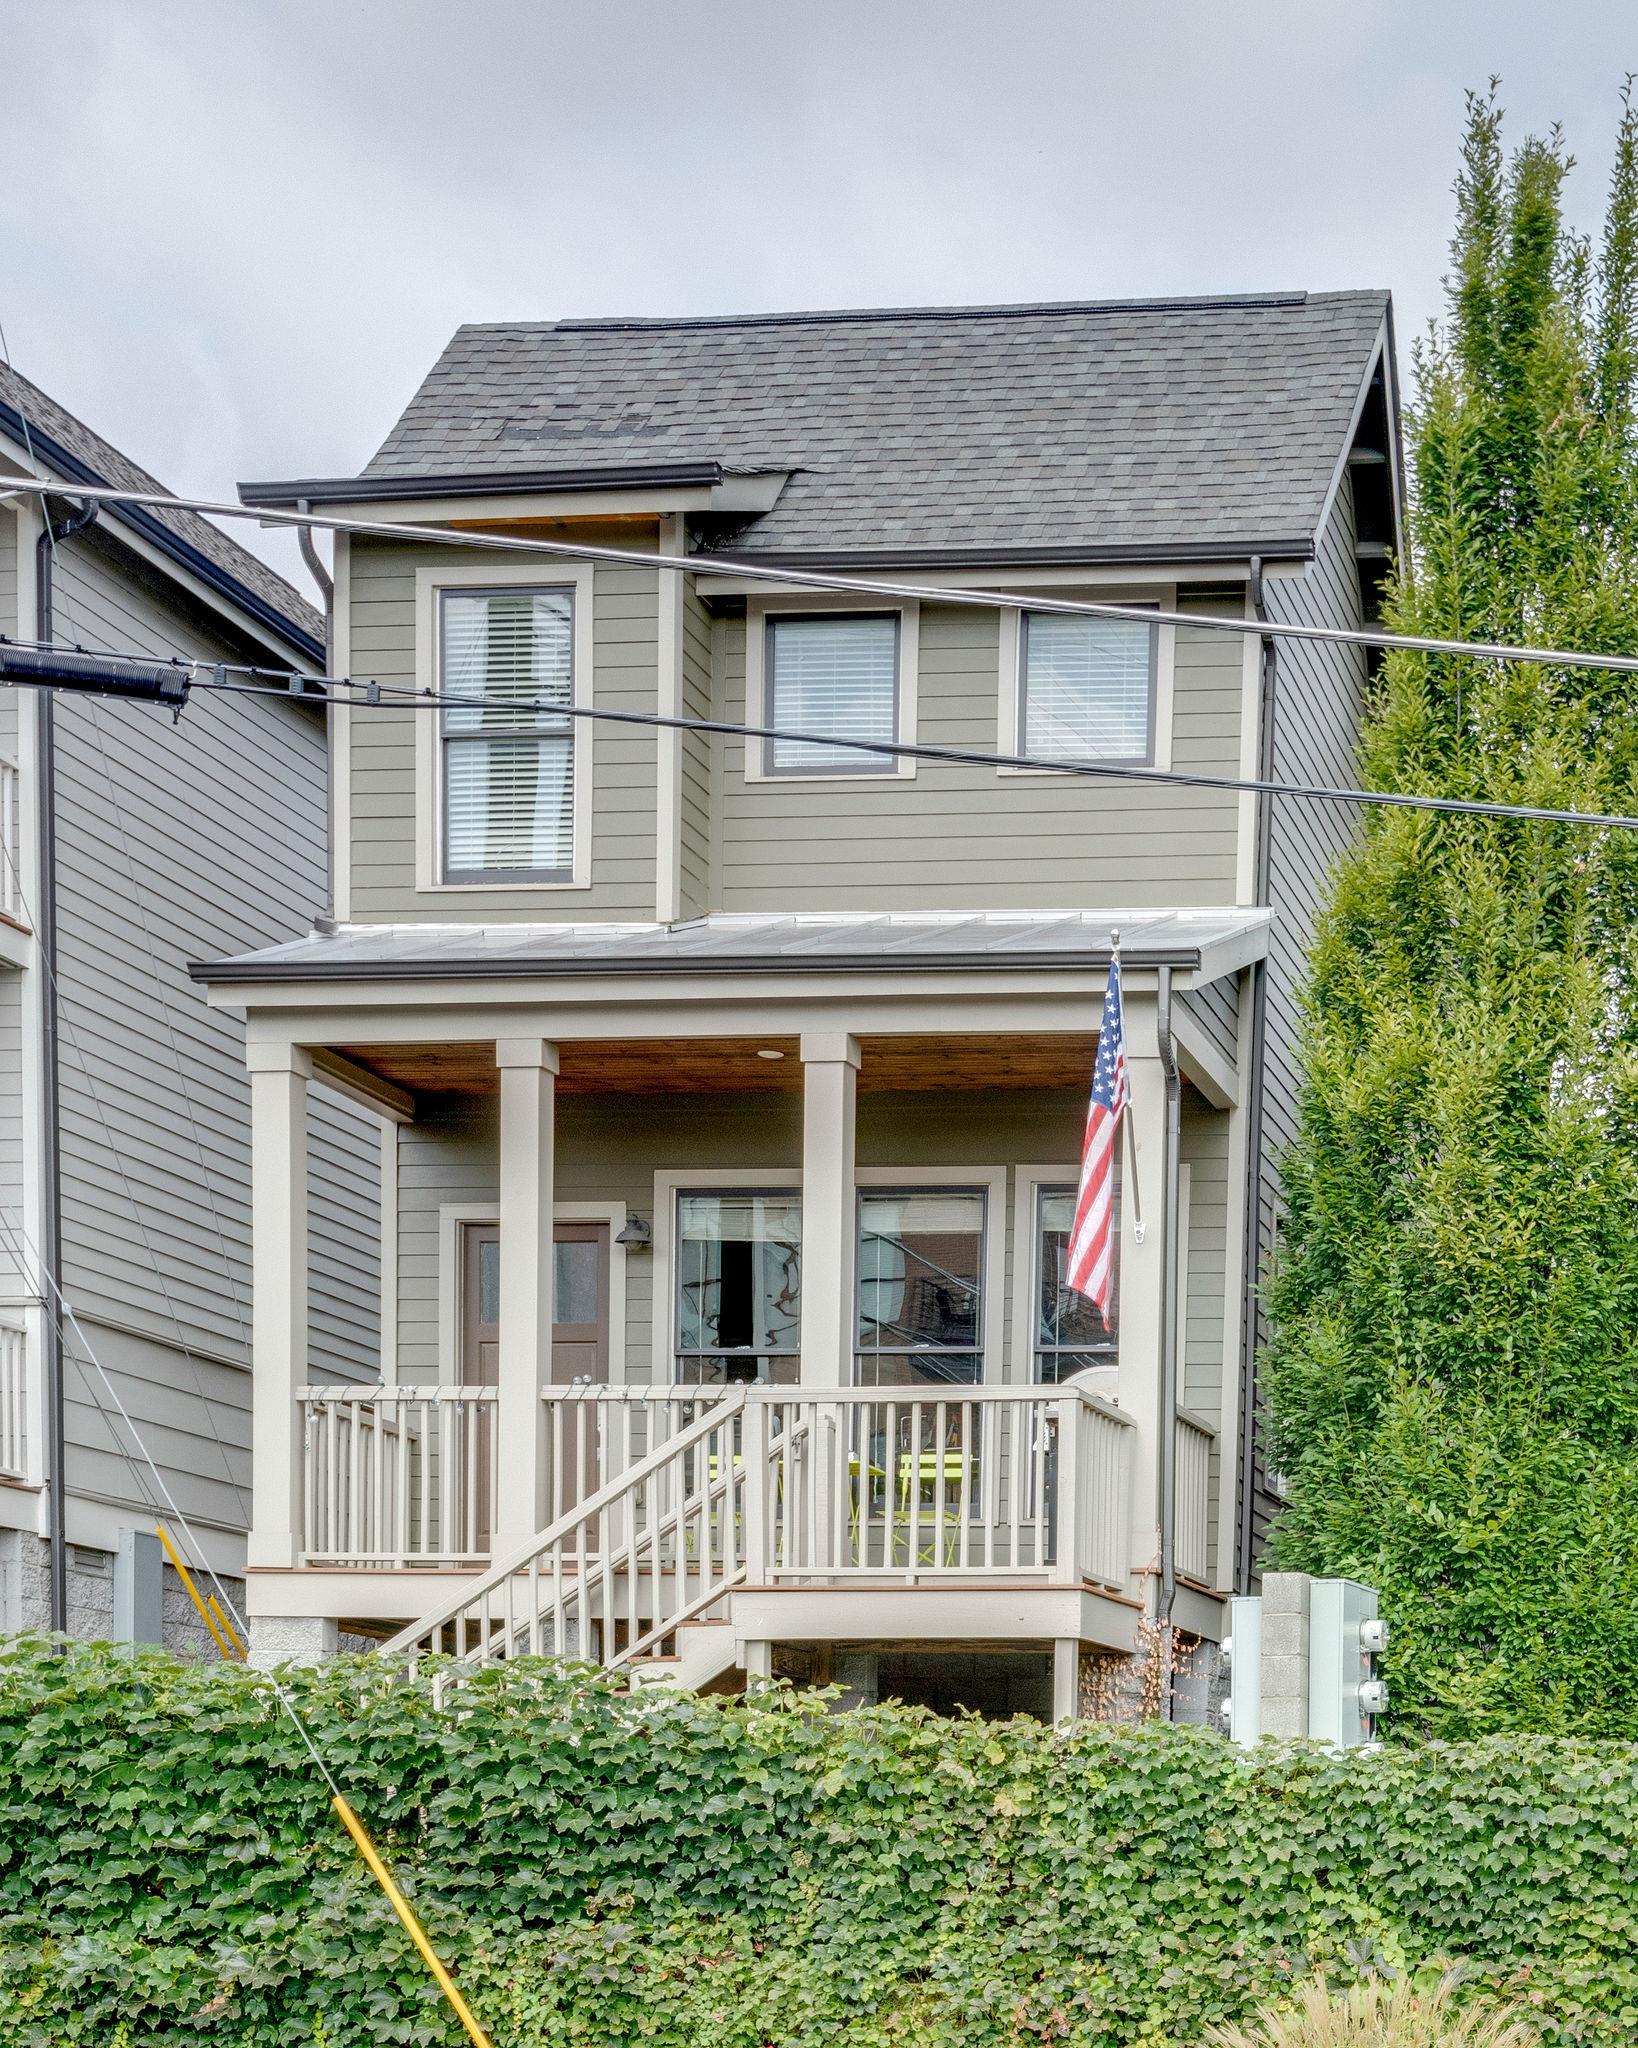 109 Gale Park Ln, Nashville, TN 37204 - Nashville, TN real estate listing